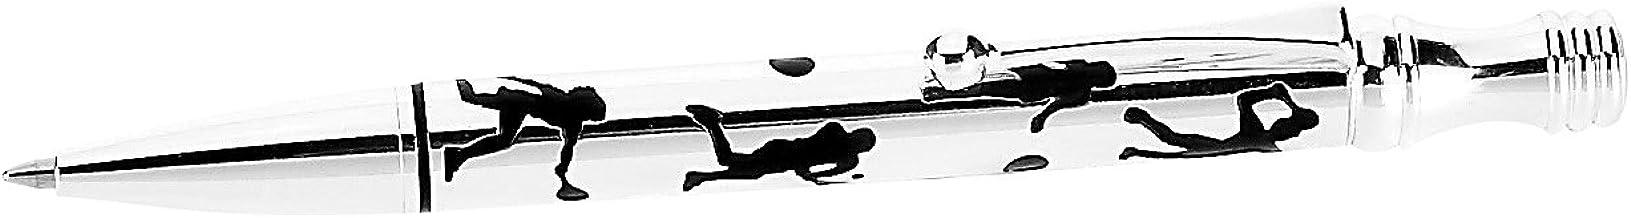 Navika USA Tennis Silhouettes Silver Ballpoint Pen, Silver/Black